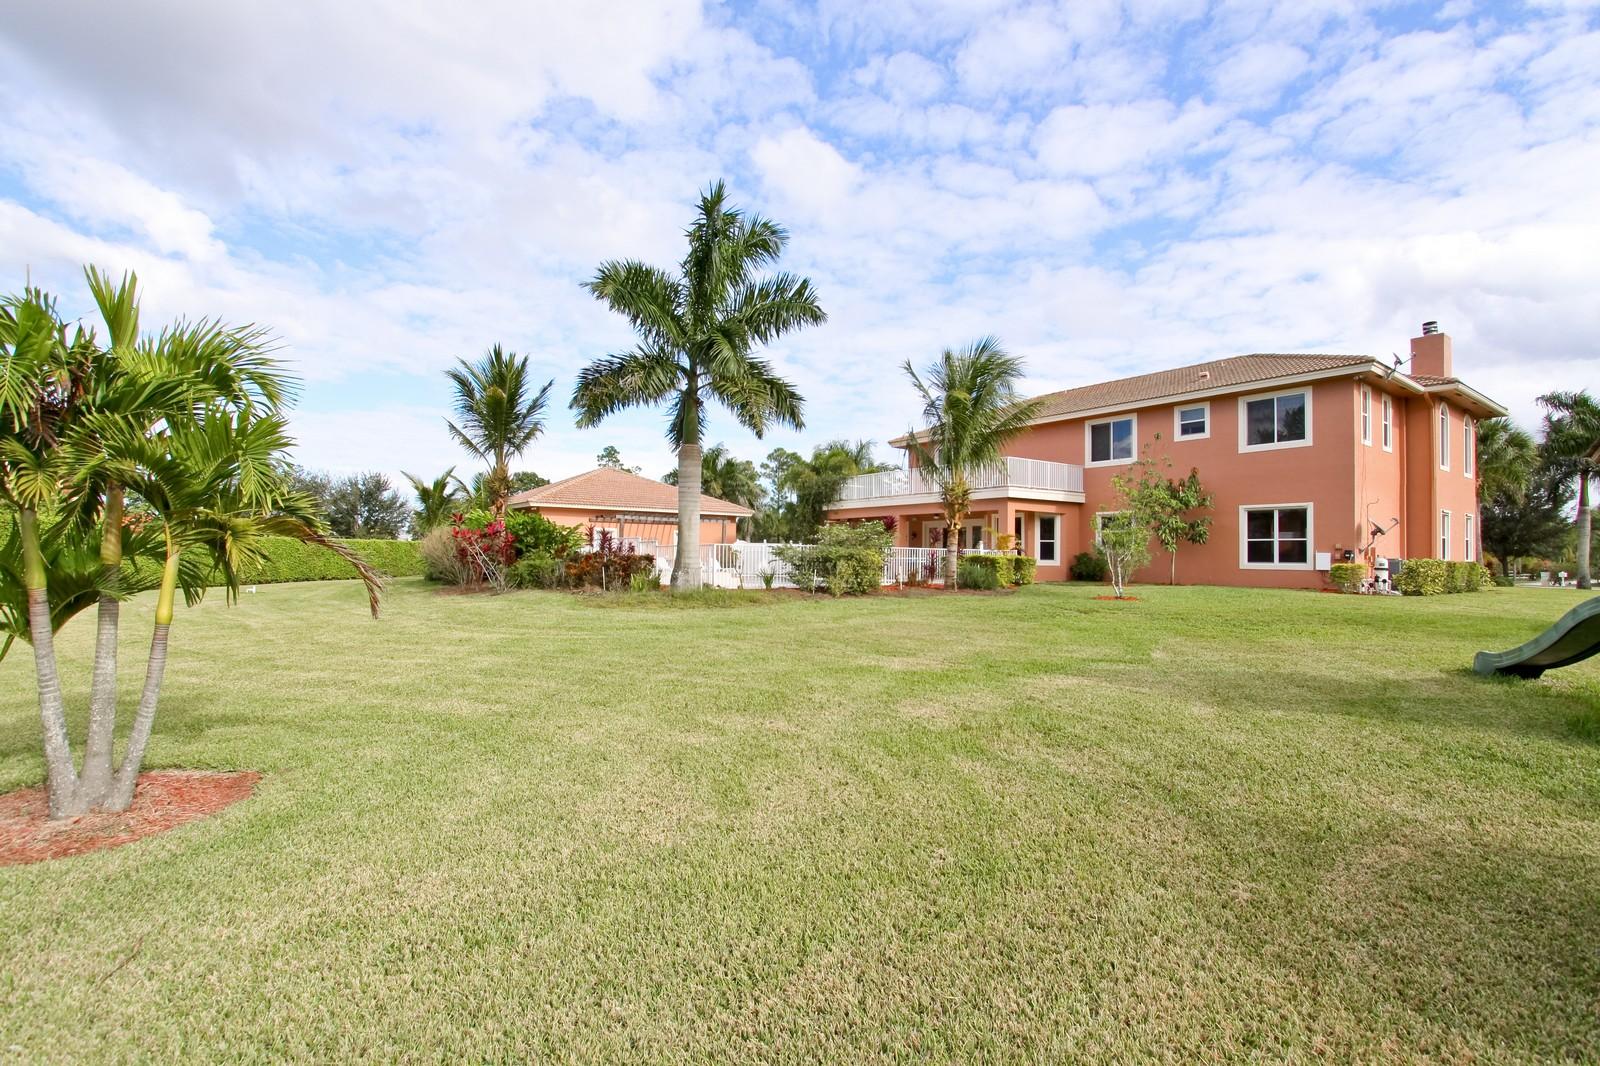 Real Estate Photography - 14542 Draft Horse Ln, Wellington, FL, 33414 - Rear View